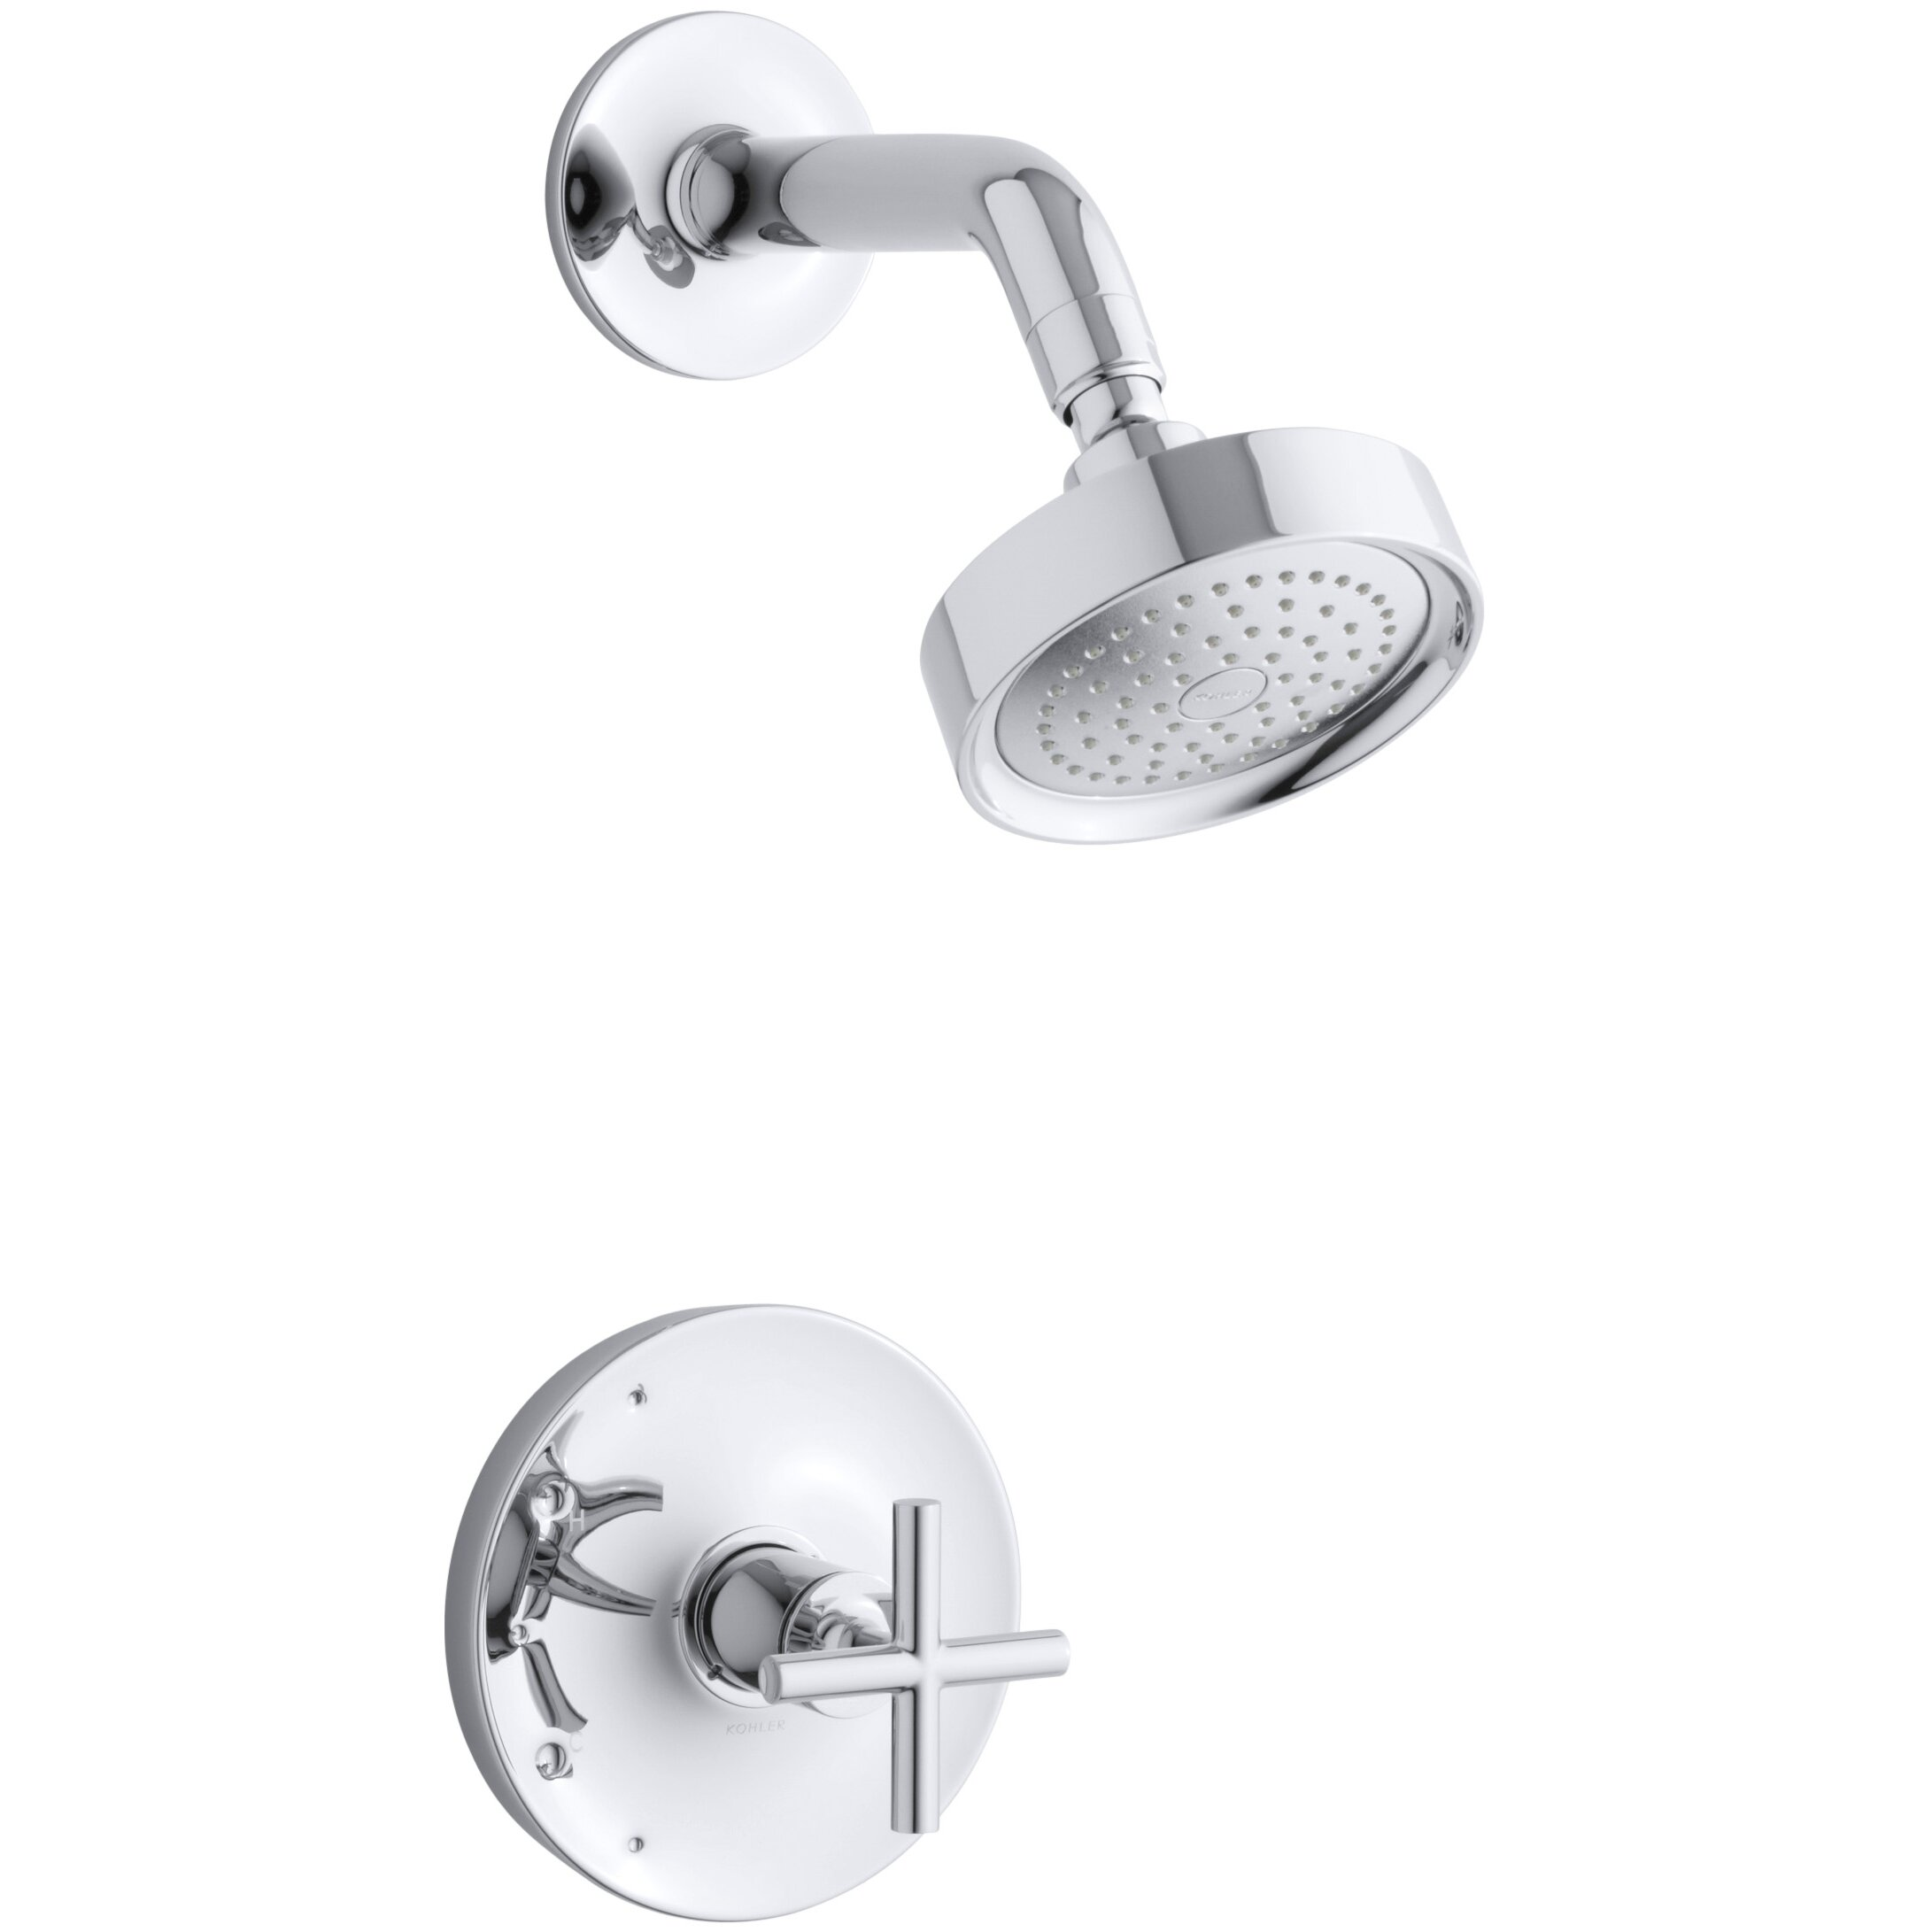 kohler purist rite temp pressure balancing shower faucet trim kohler purist rite temp pressure balancing shower faucet trim cross handle valve